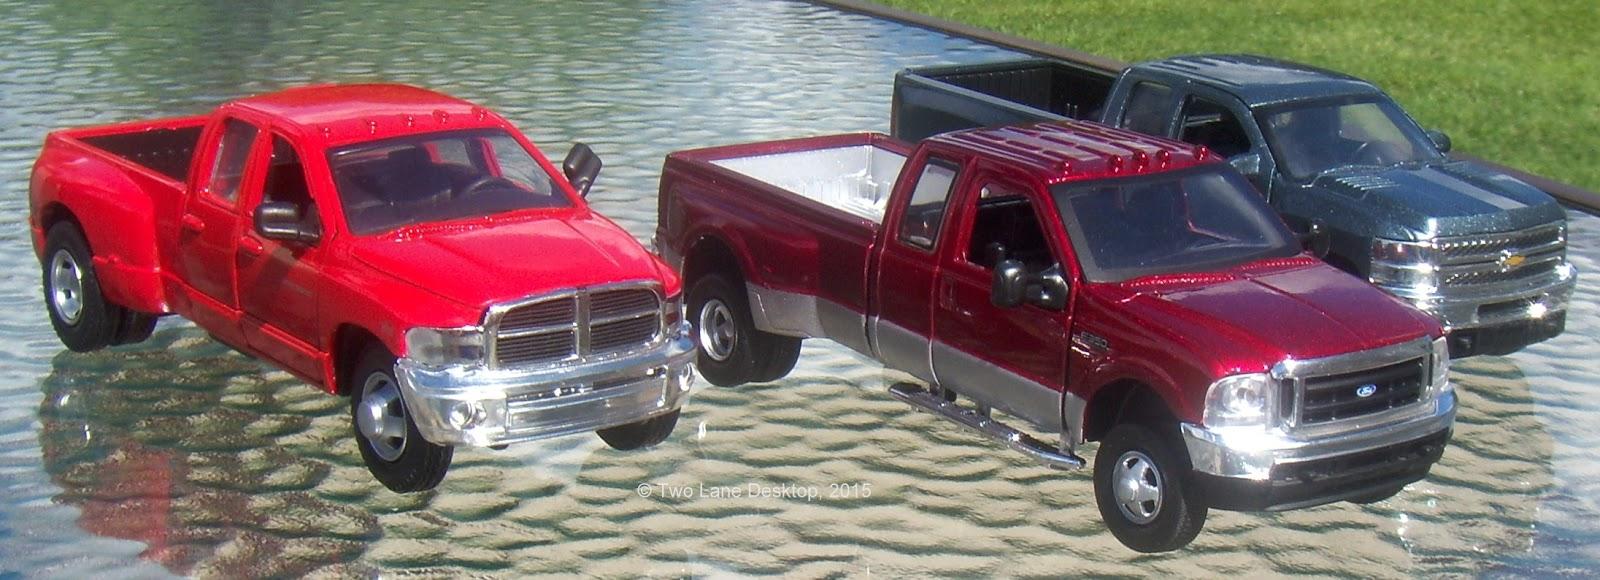 comparison new ray 1 32 chevy silverado 2500hd dodge ram 3500 and ford f 350 super duty [ 1600 x 580 Pixel ]